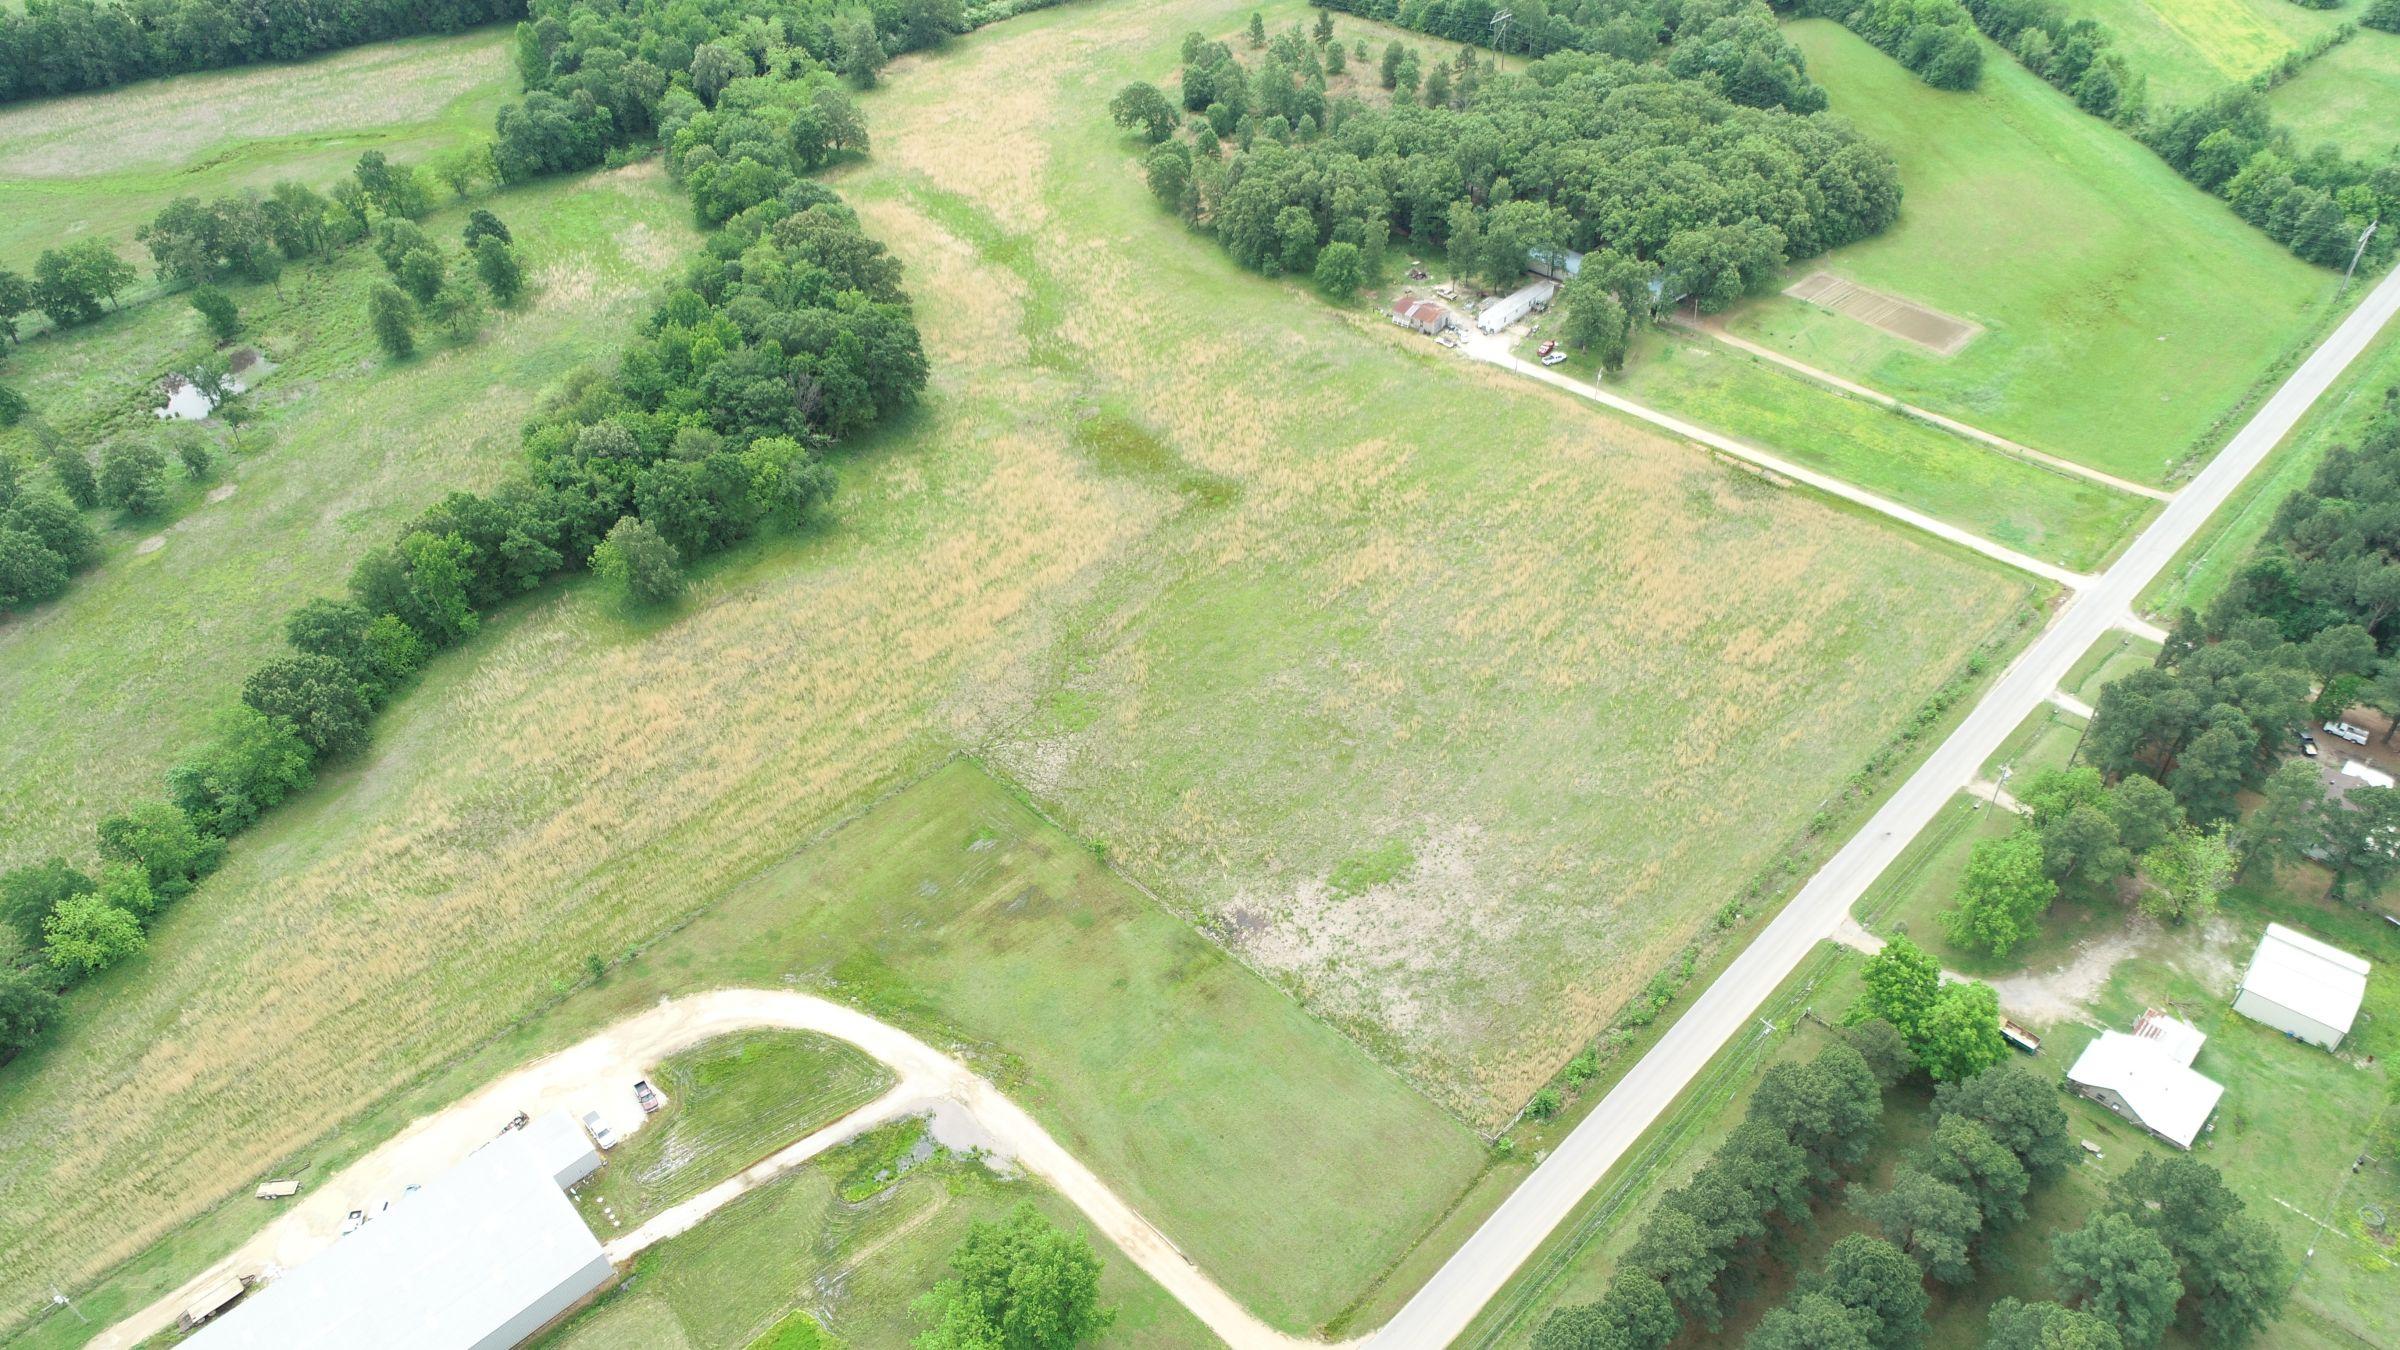 land-craighead-county-arkansas-52-acres-listing-number-15002-1-2020-06-01-215646.JPG